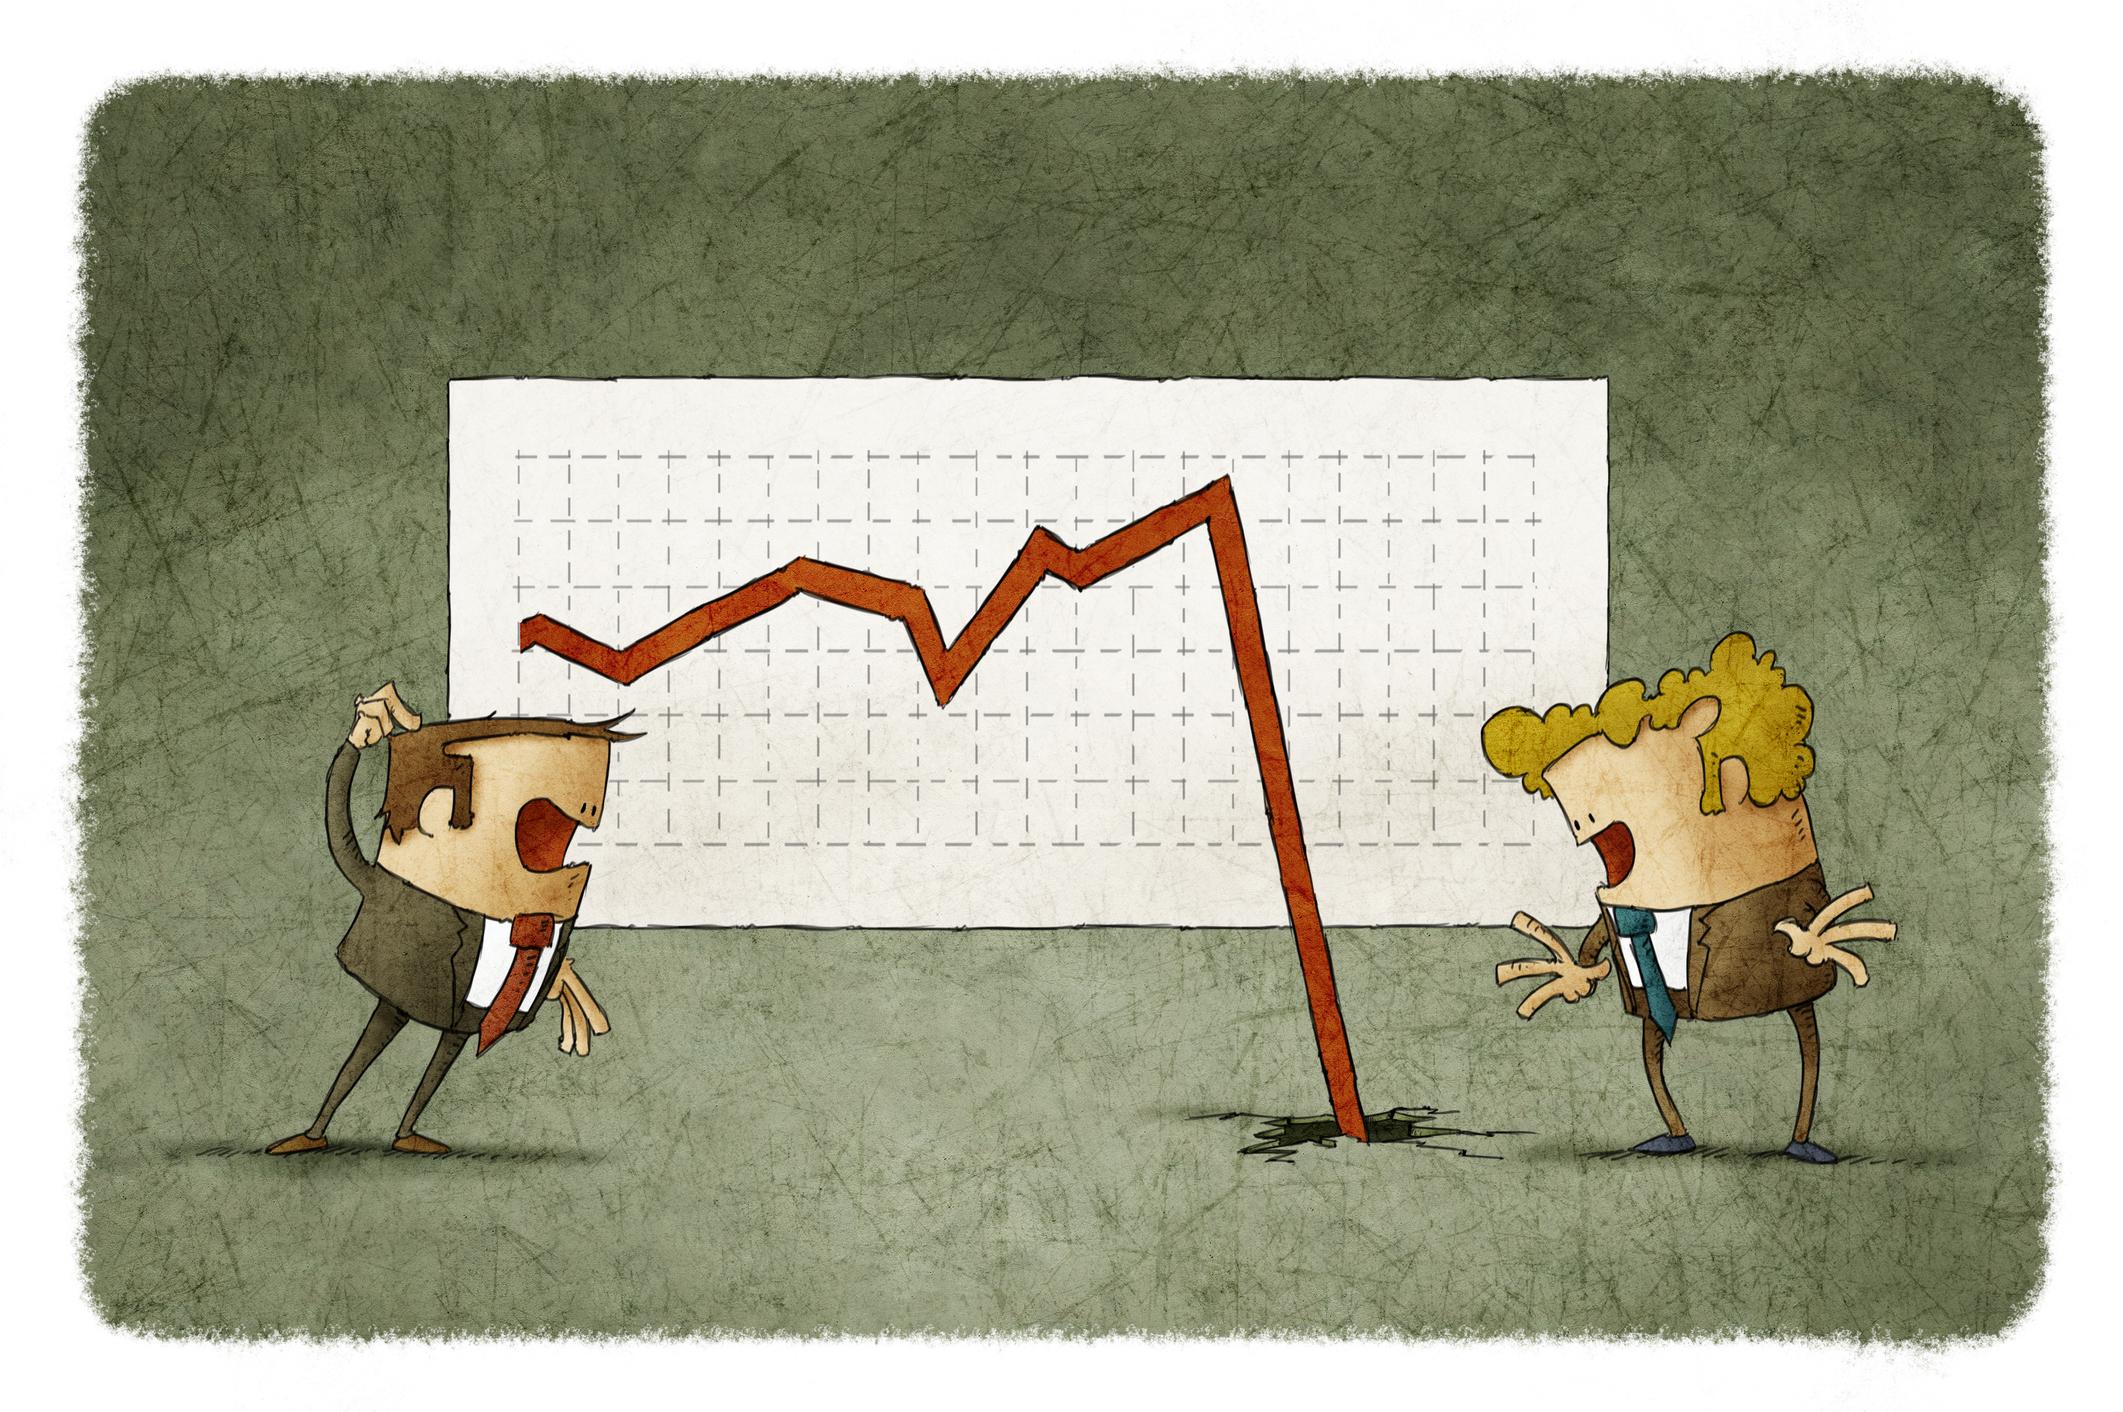 Cartoon characters examine falling stock chart